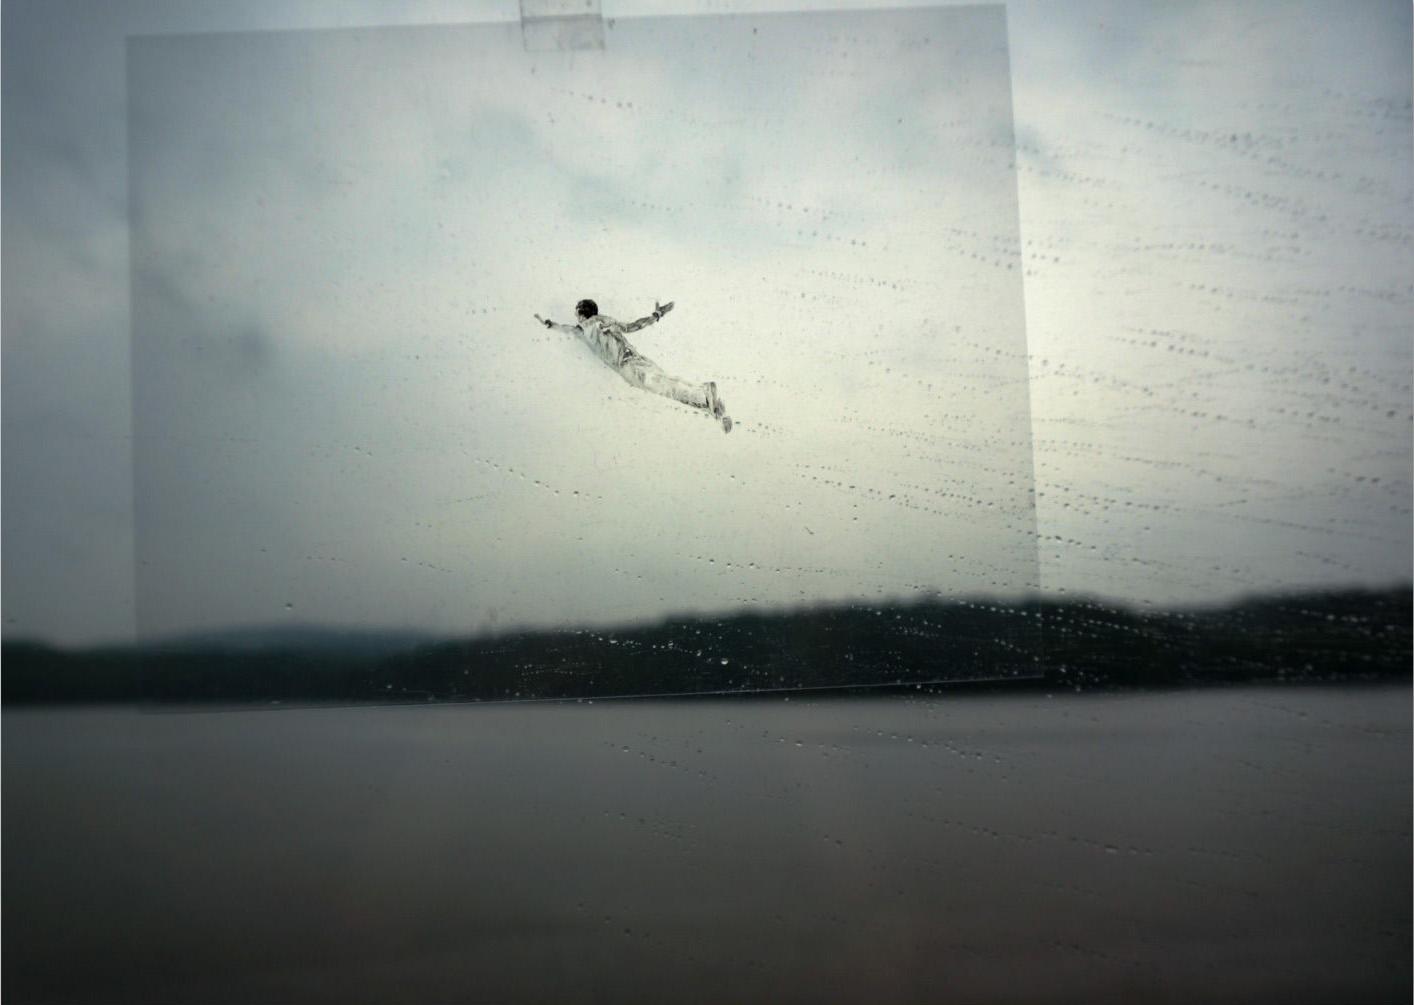 AMTK69; 2014; Postcard; 148x105mm